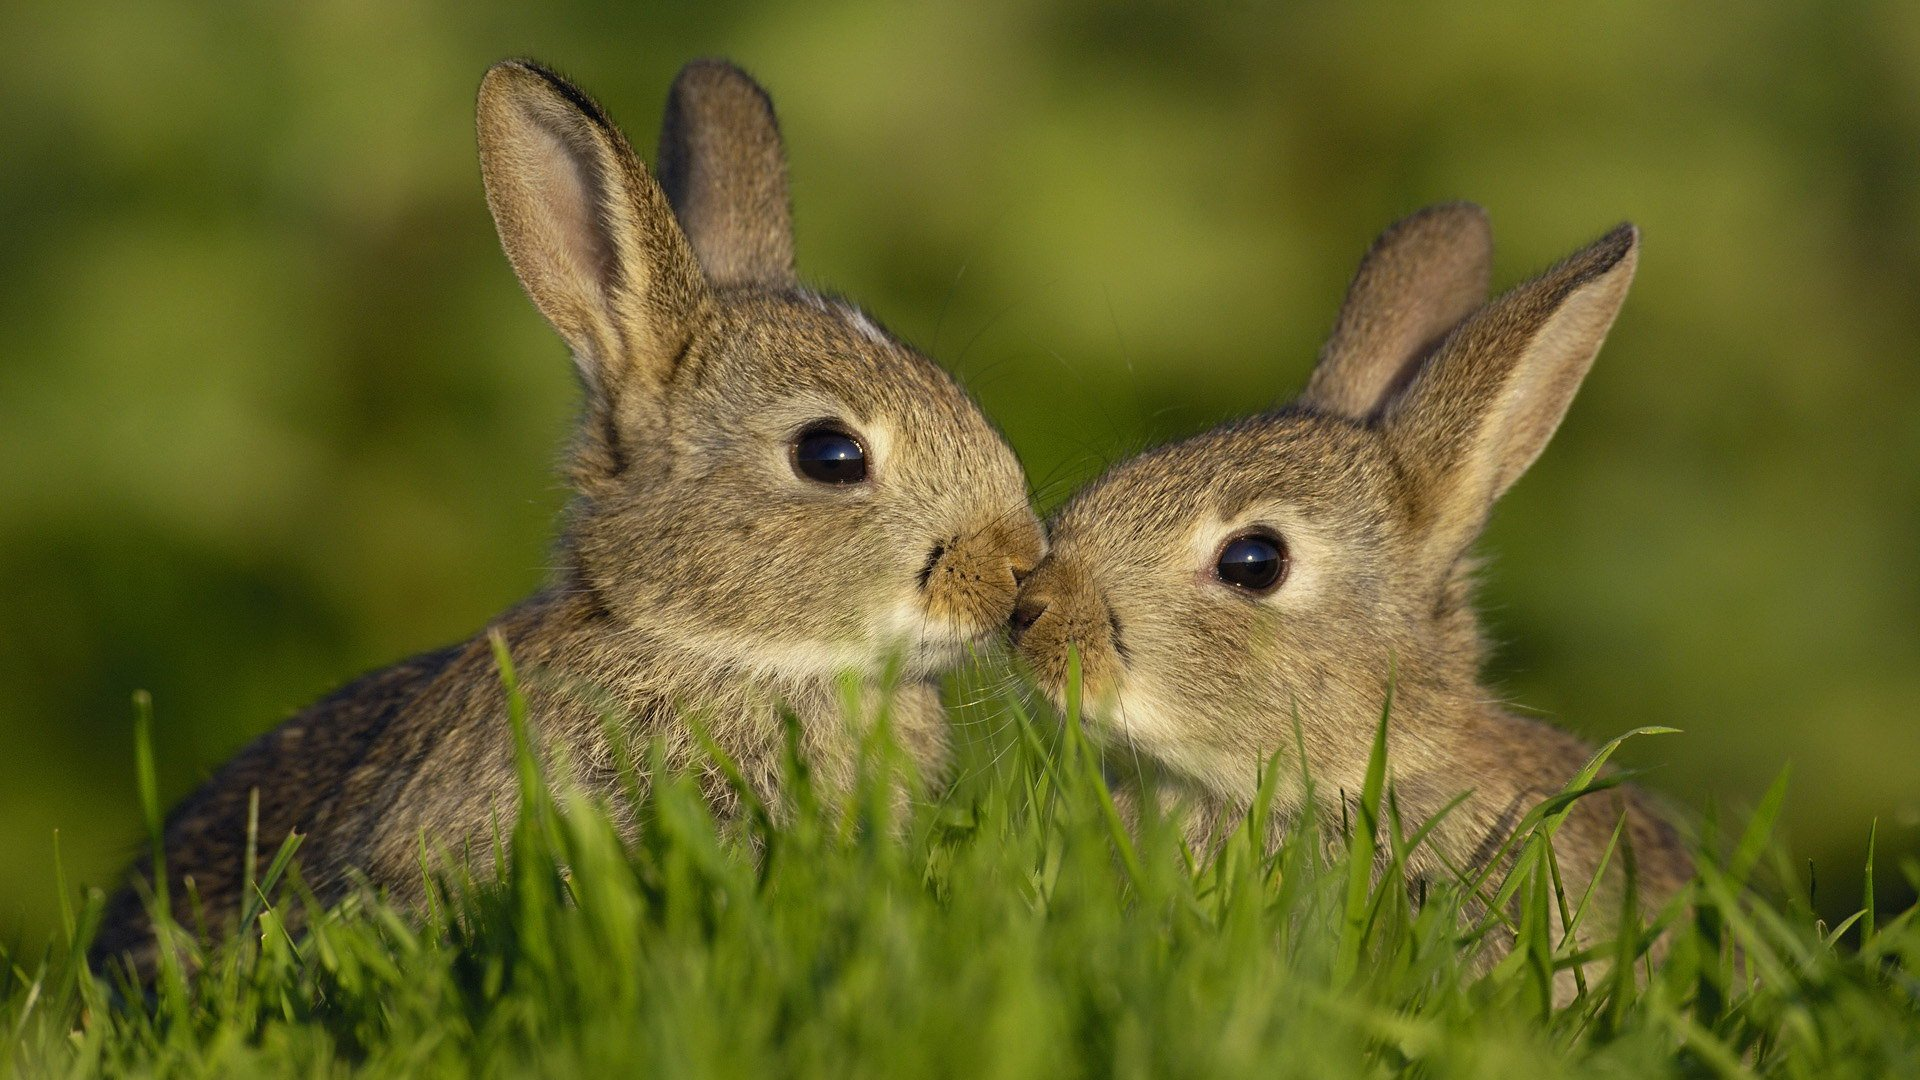 Милые кролики » 1000prikolov.com: приколы и ...: 1000prikolov.com/zhivotnye/5723-milye-kroliki.html